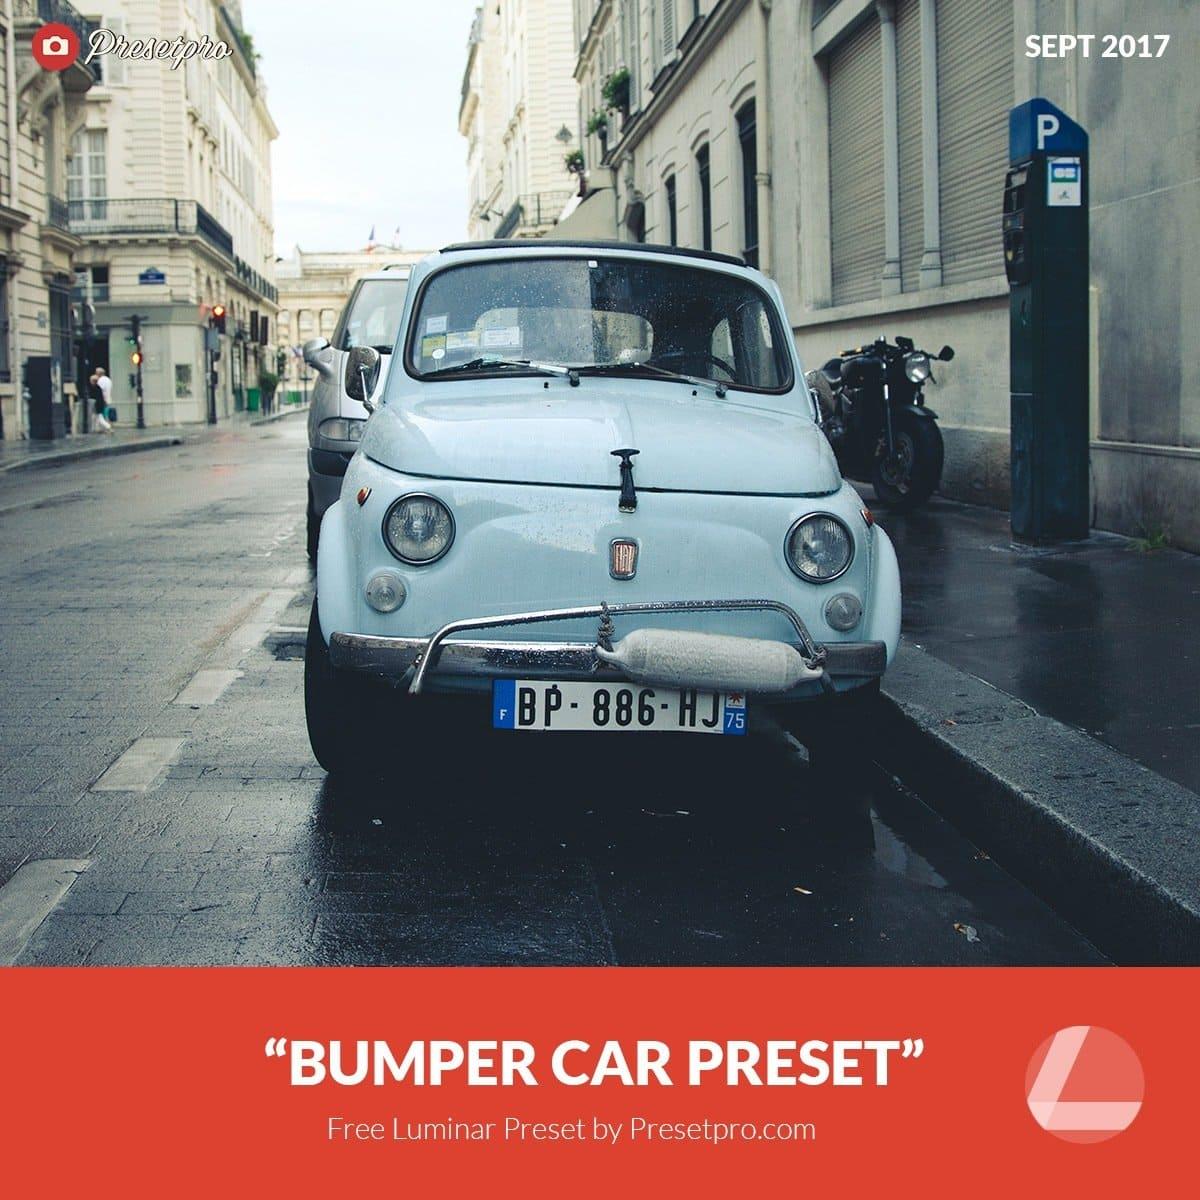 Free-Luminar-Preset-Bumper-Car-Cover